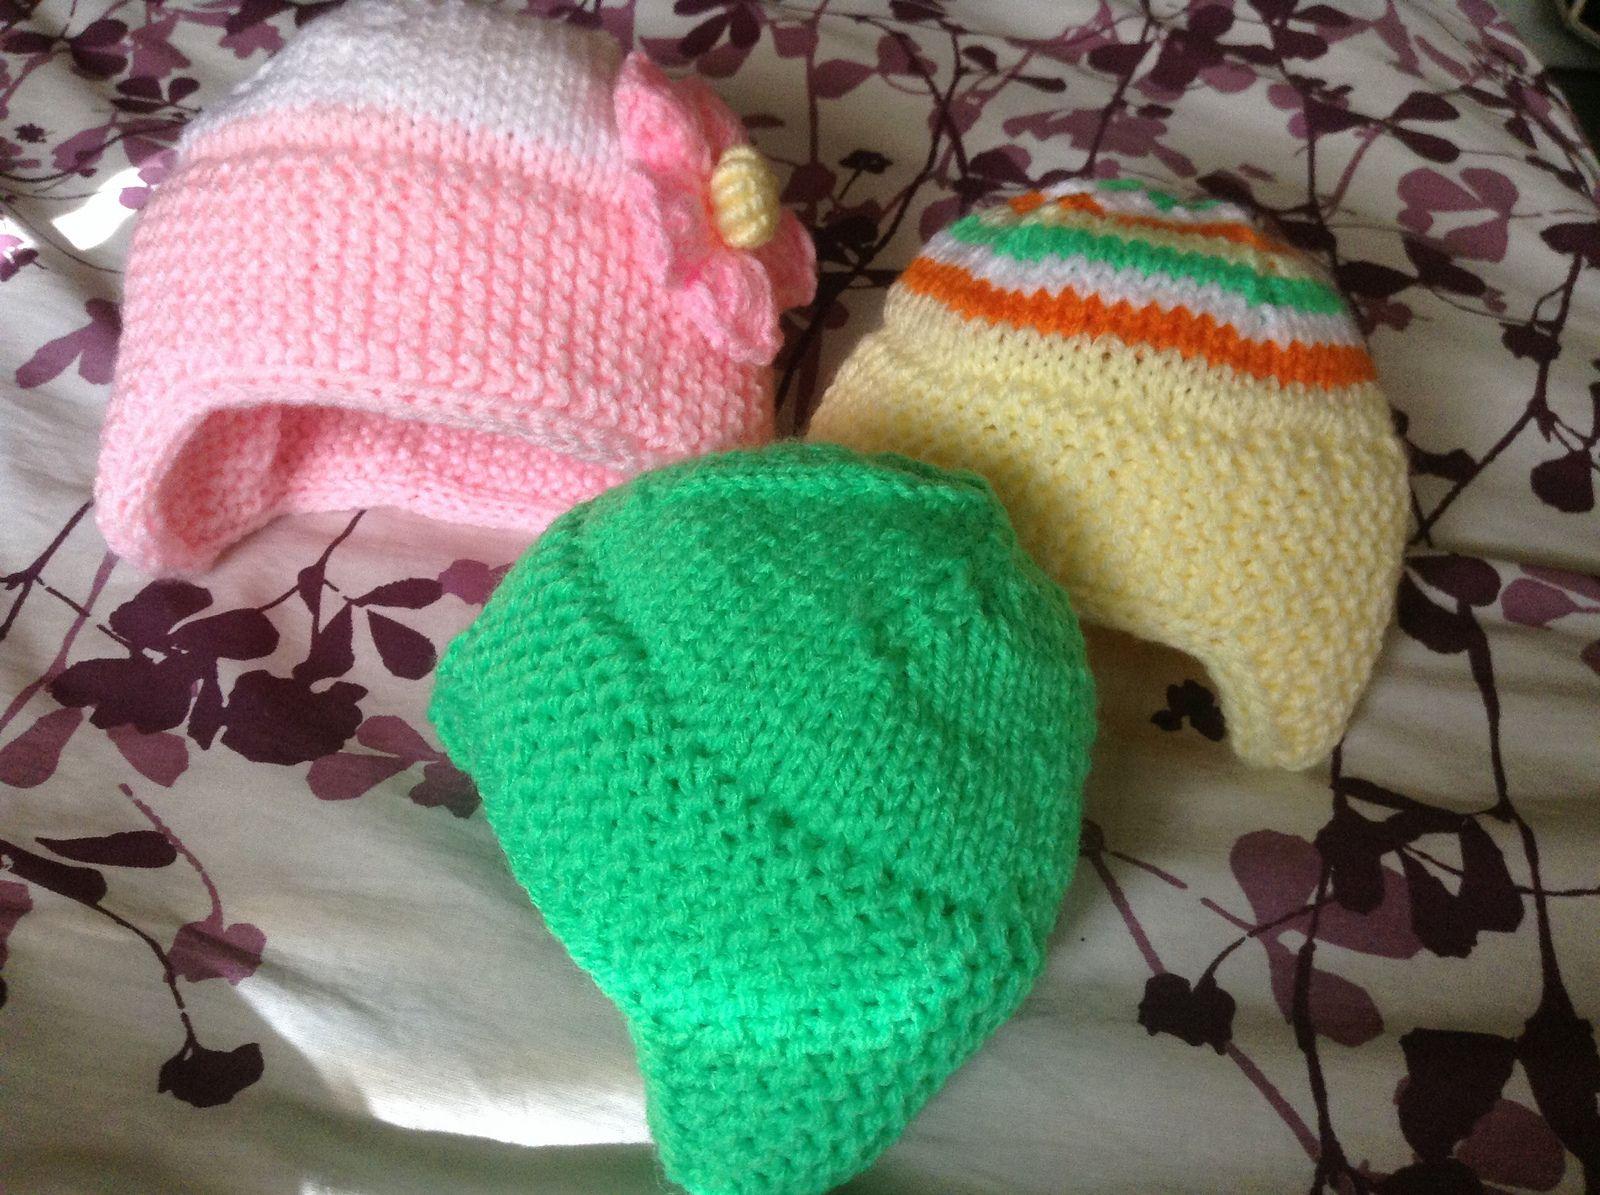 d7c358cc0b8 Ravelry  jvallas  1898 Hats mult. sizes Free Knitting